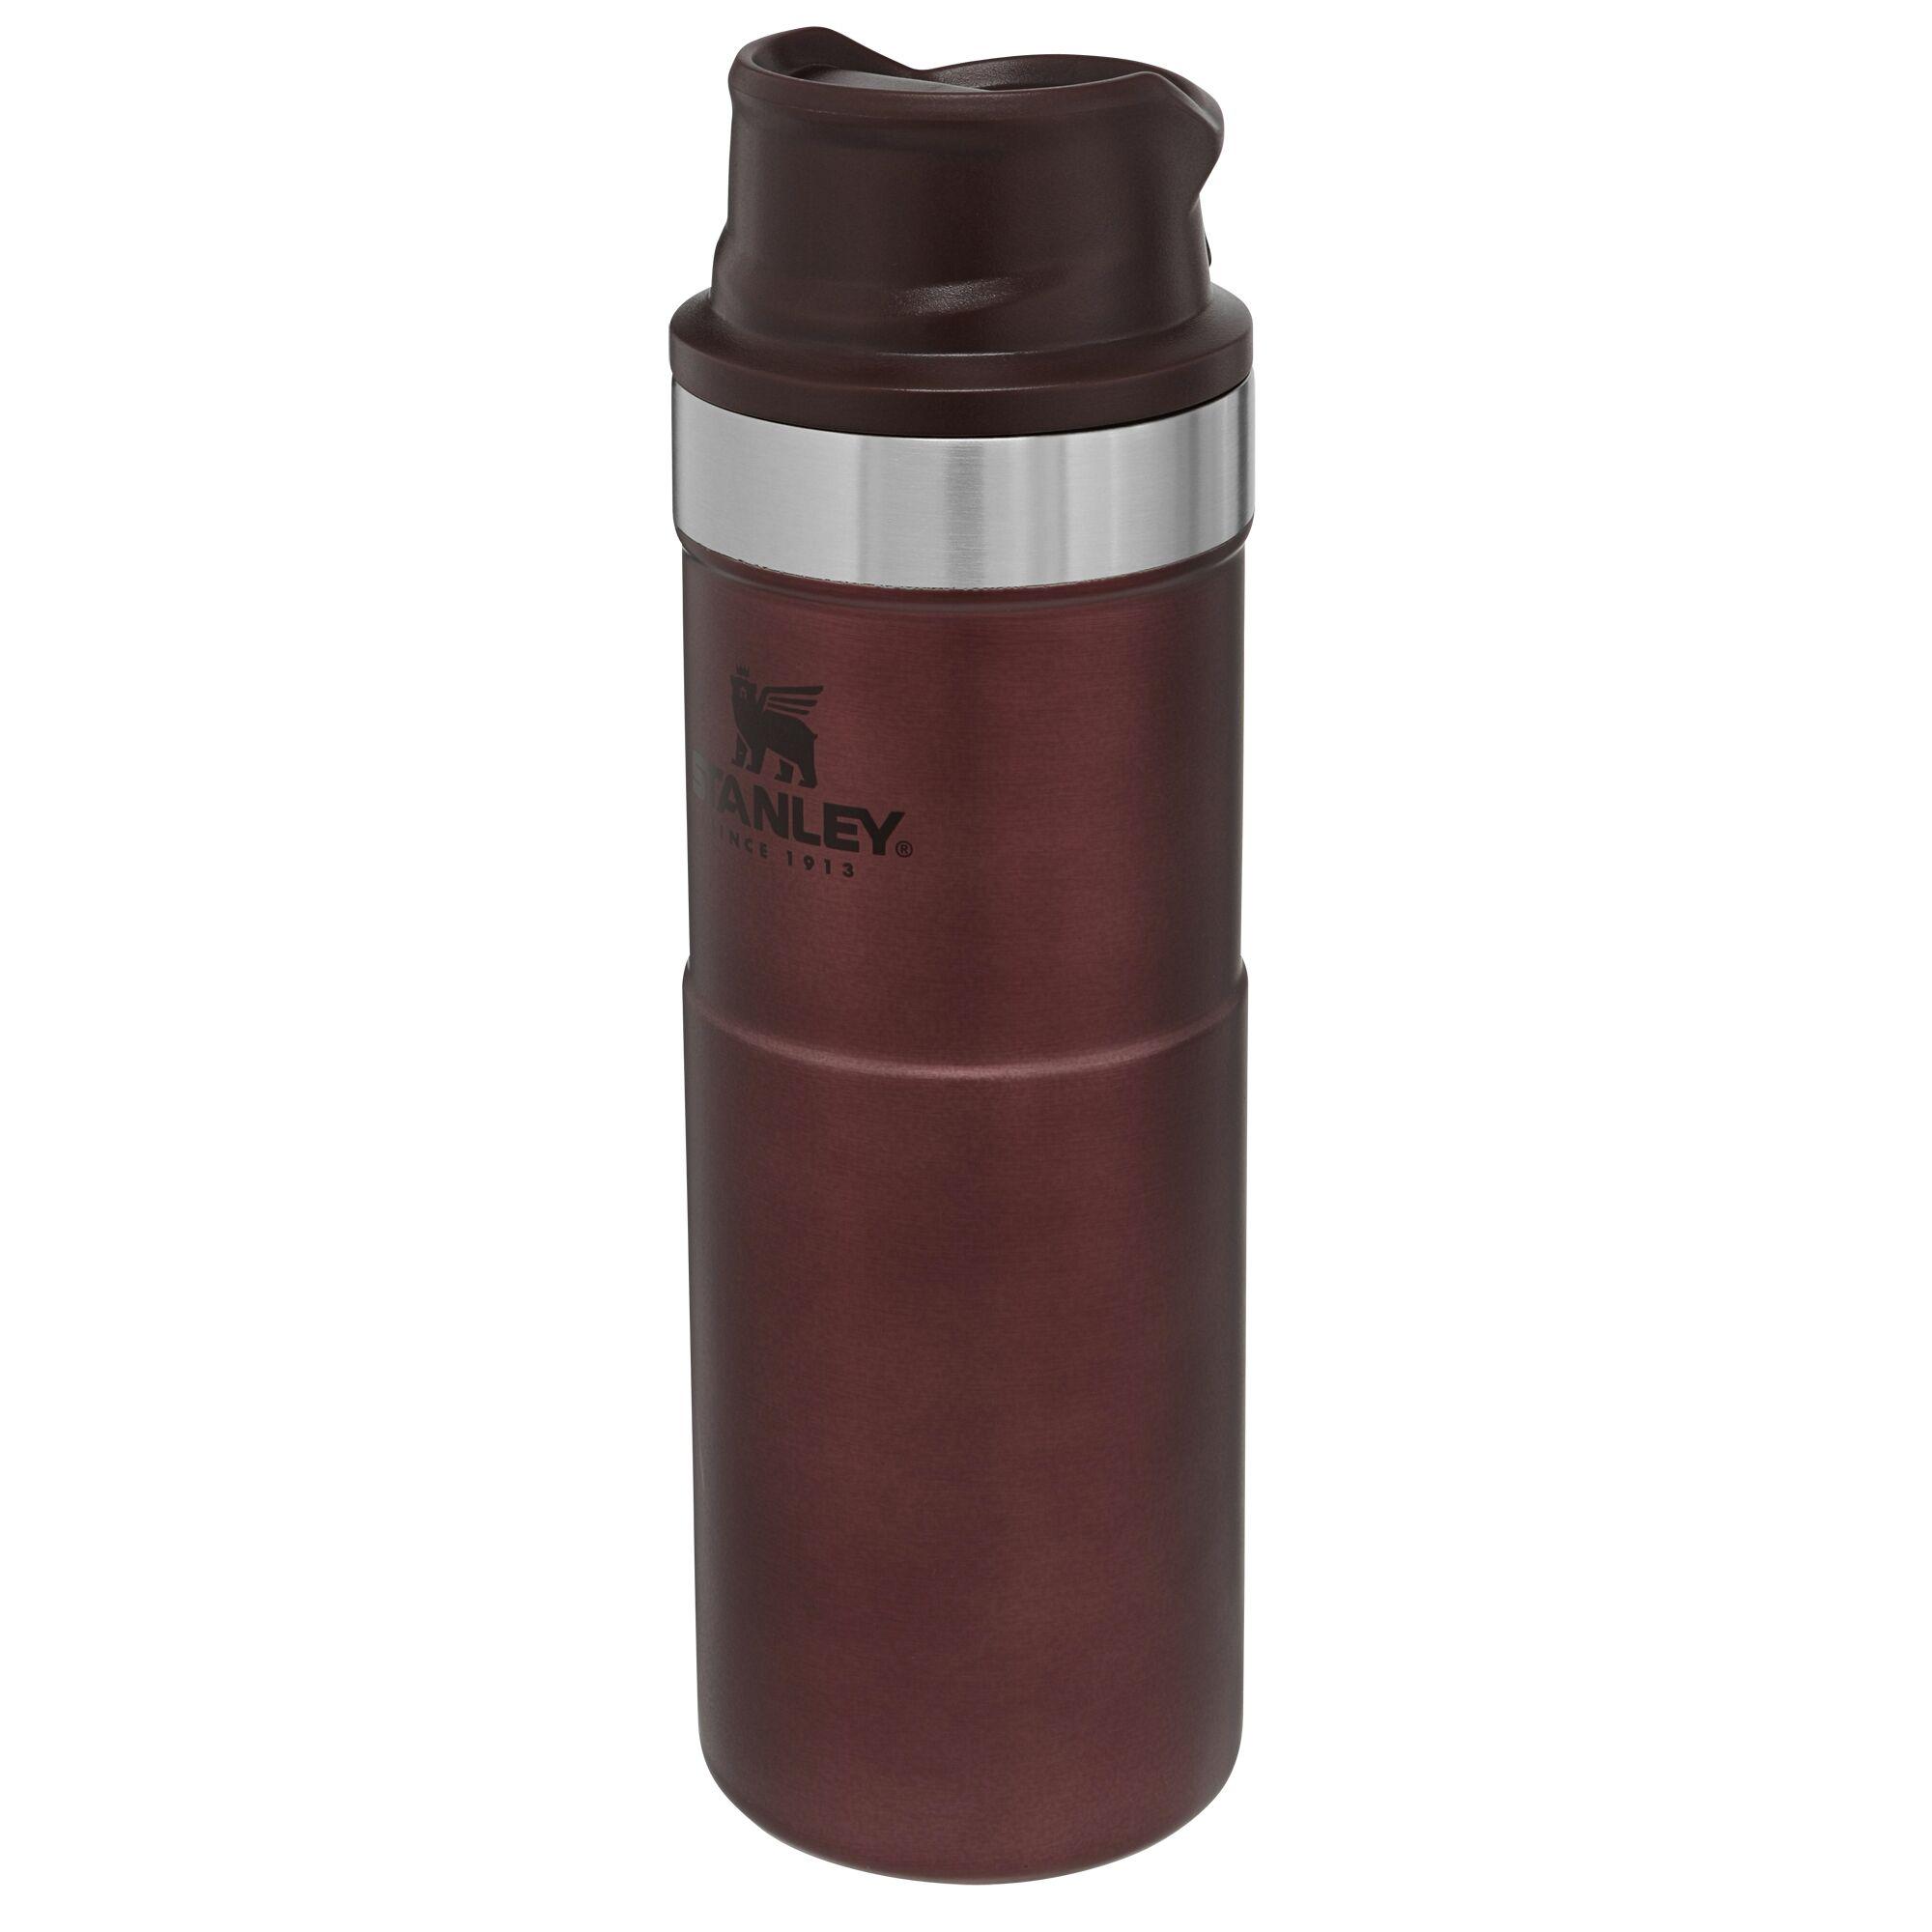 Stanley Termokrūze The Trigger-Action Travel Mug Classic 0,47L sarkana 2806439120 termoss